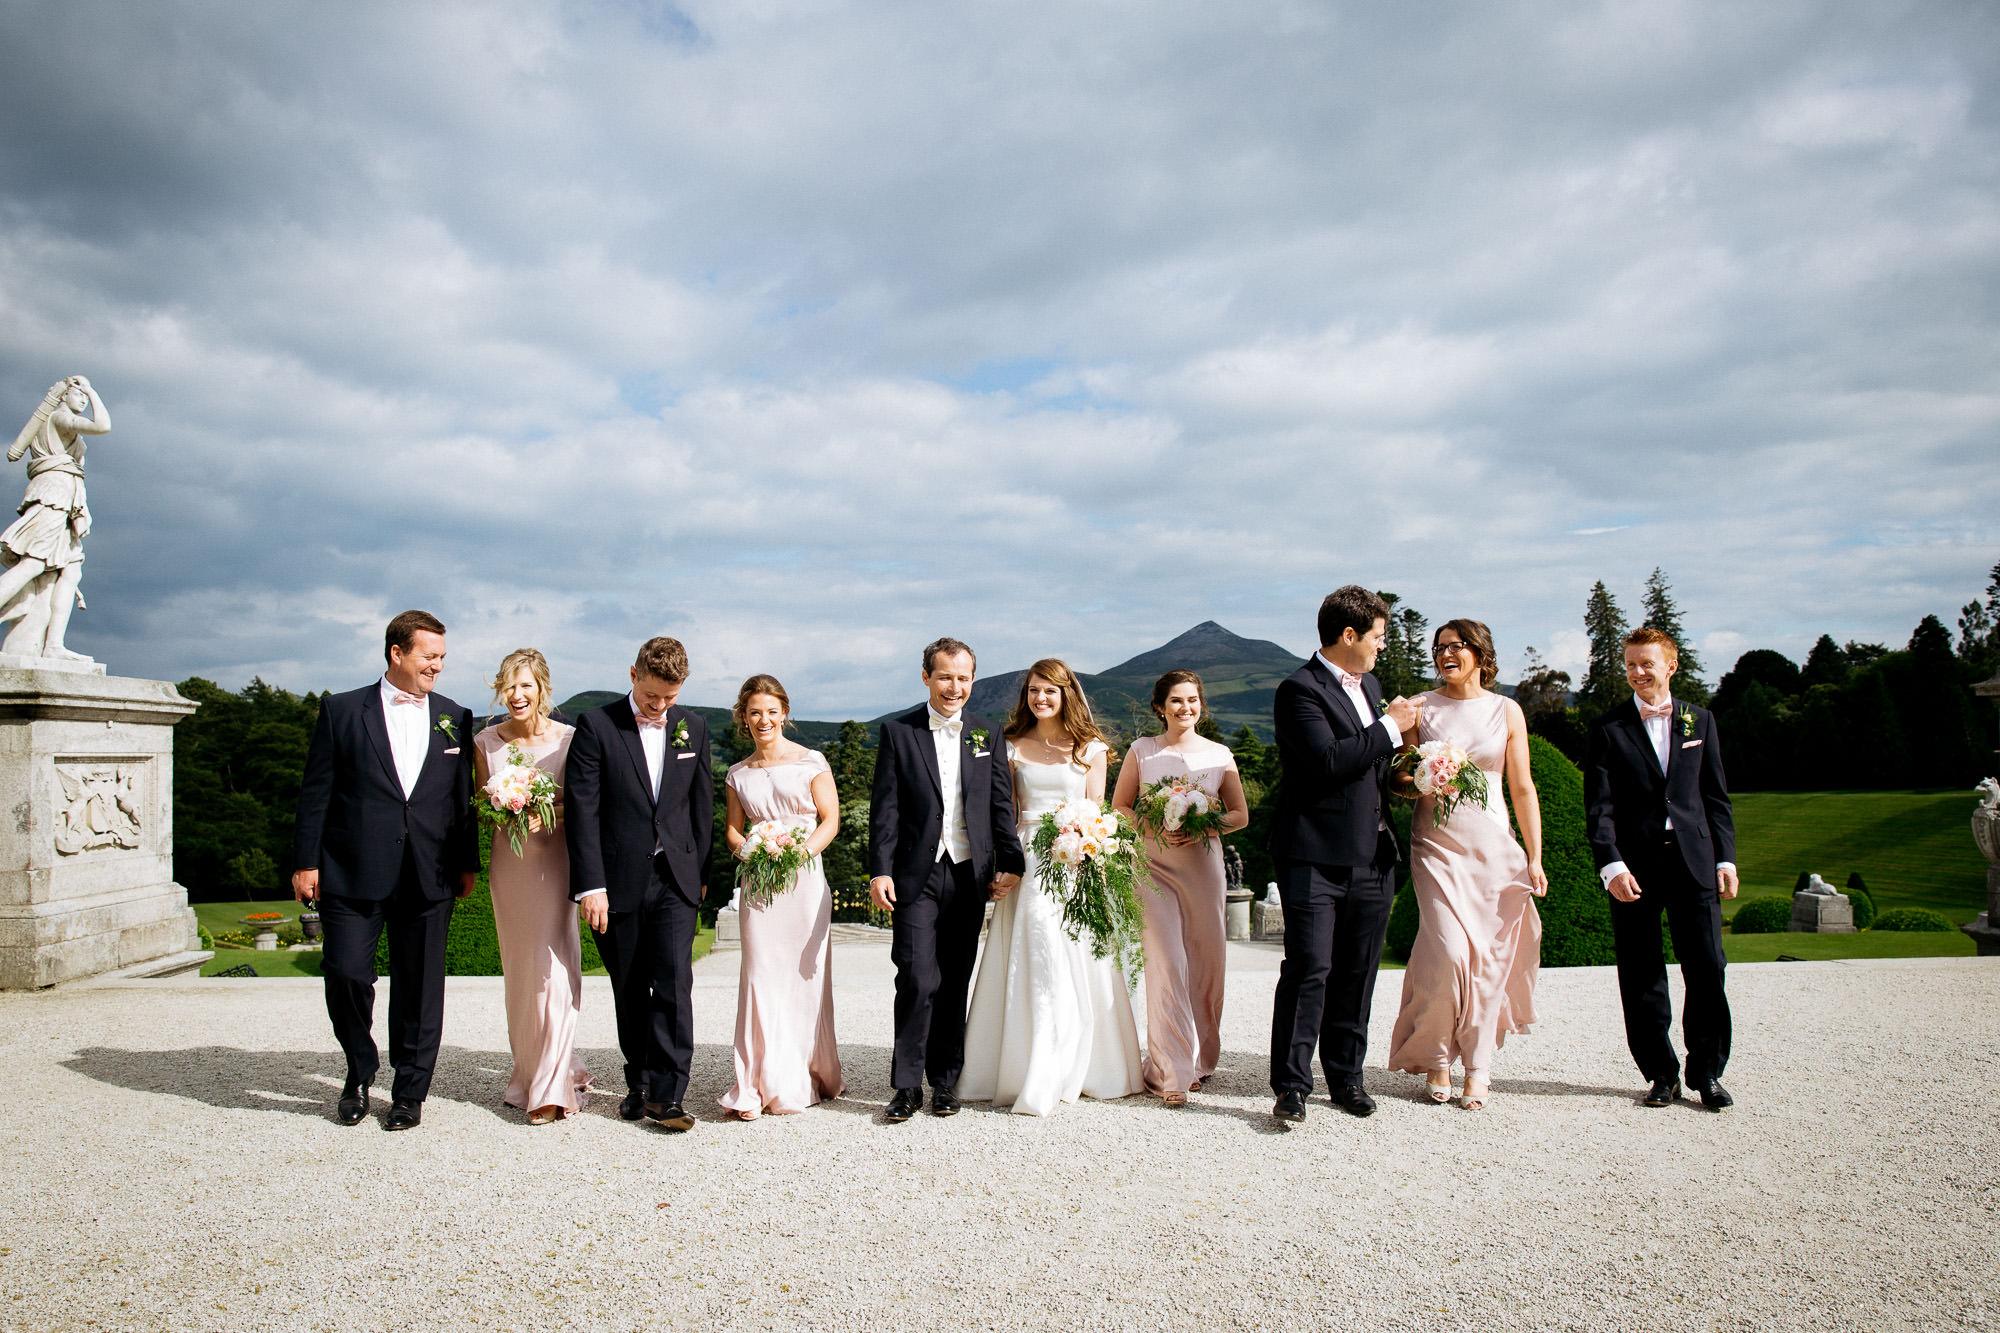 clairebyrnephotography-wedding-Emma-Max-17.jpg